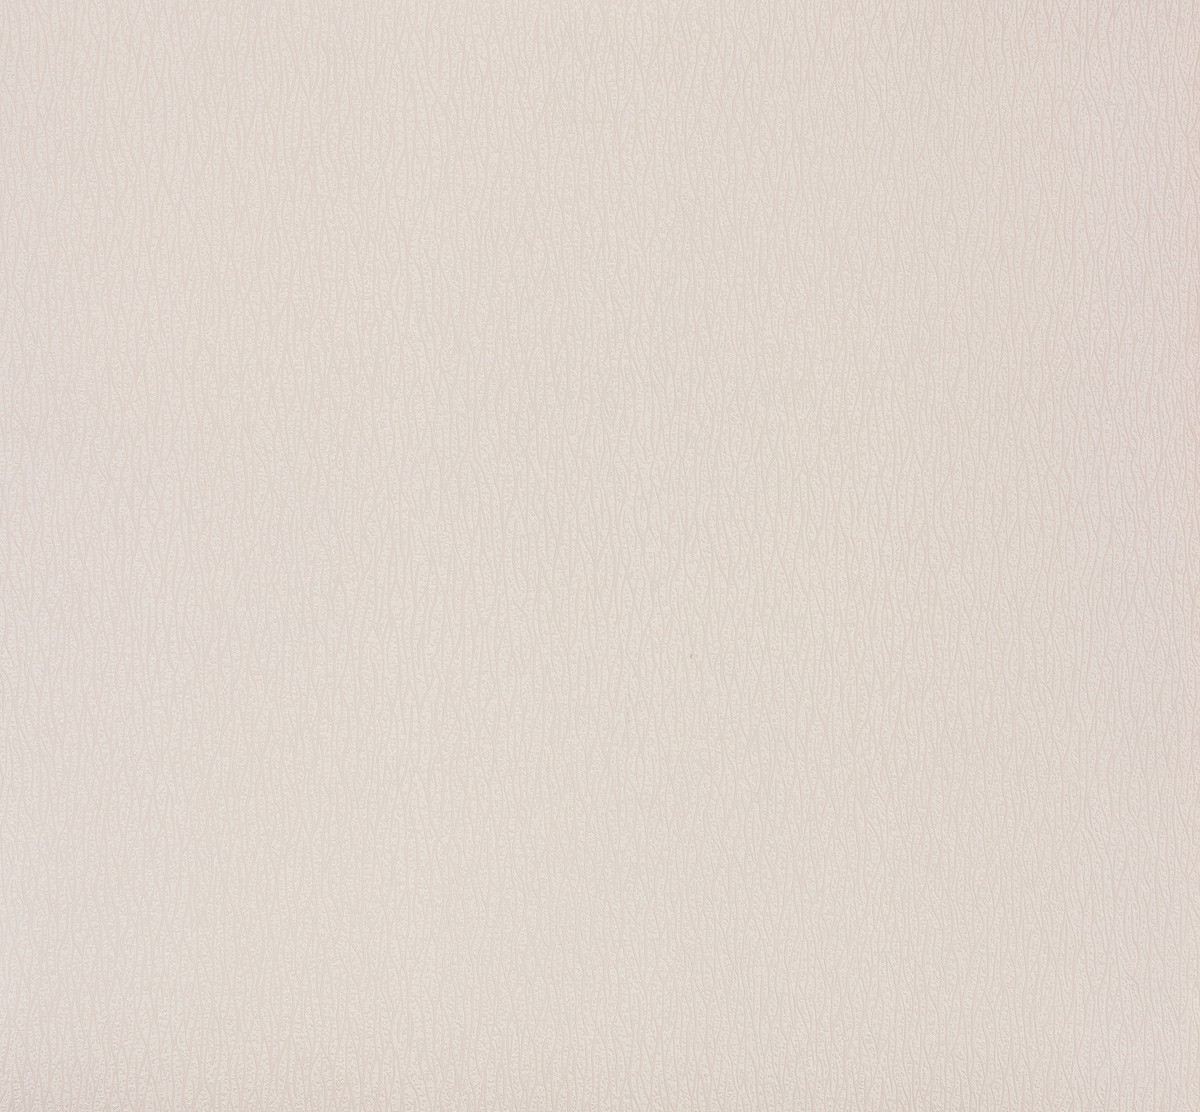 tapete wei uni atlanta livingwalls 957191. Black Bedroom Furniture Sets. Home Design Ideas